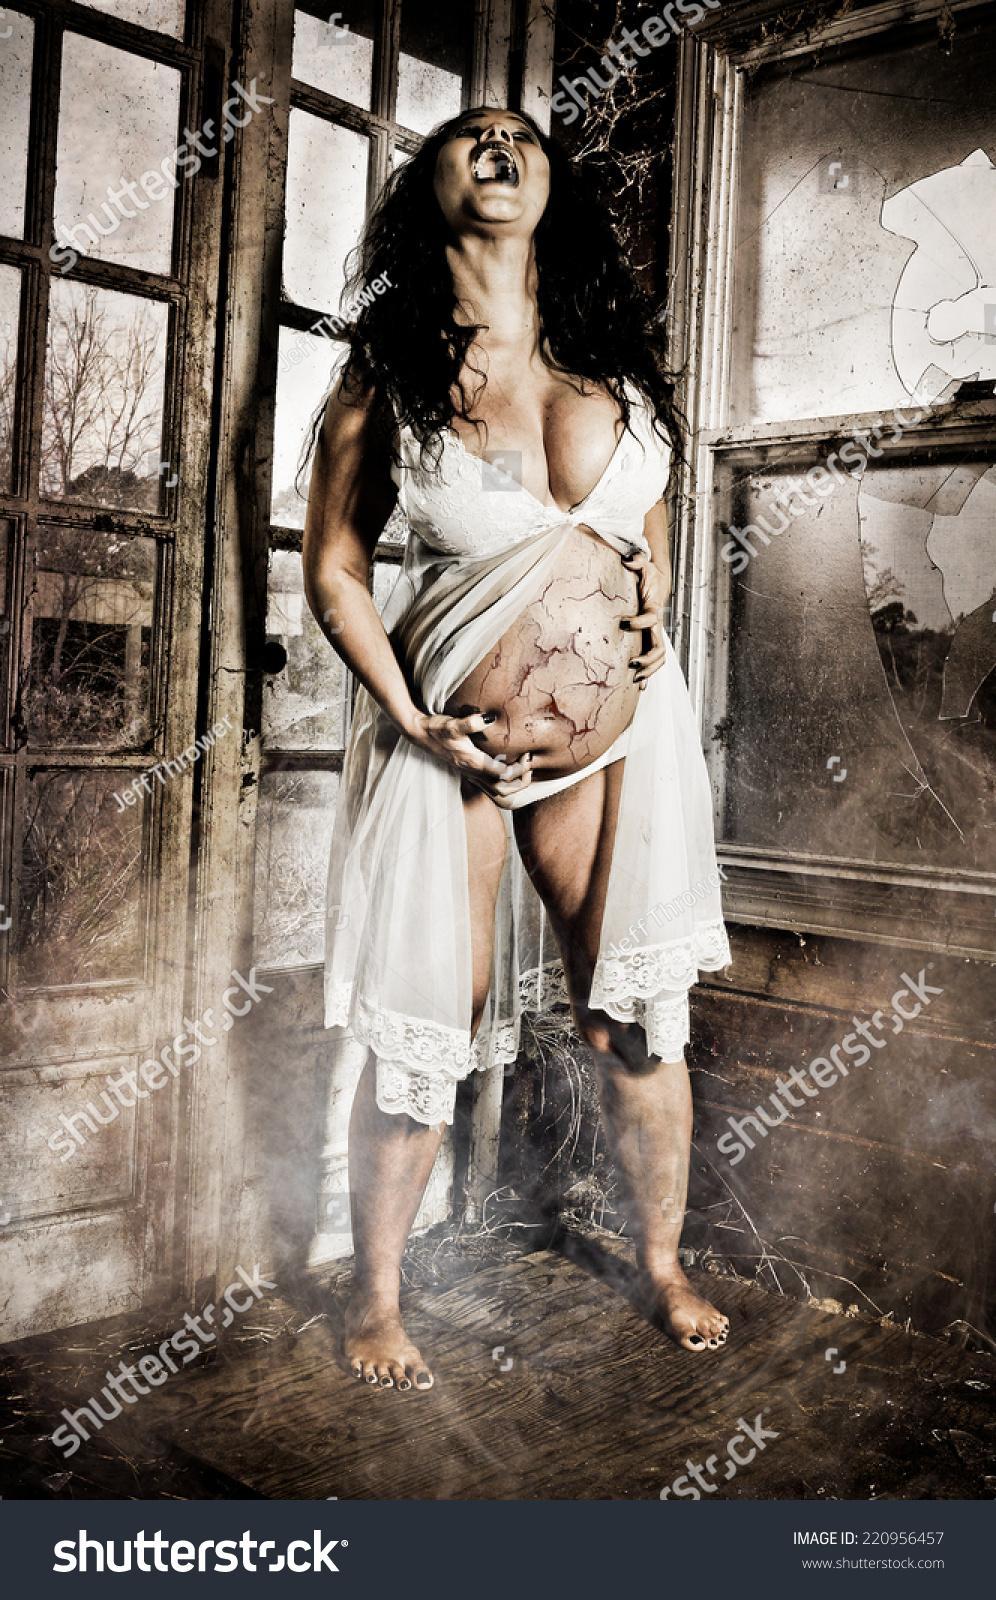 pregnant voyeur -porn